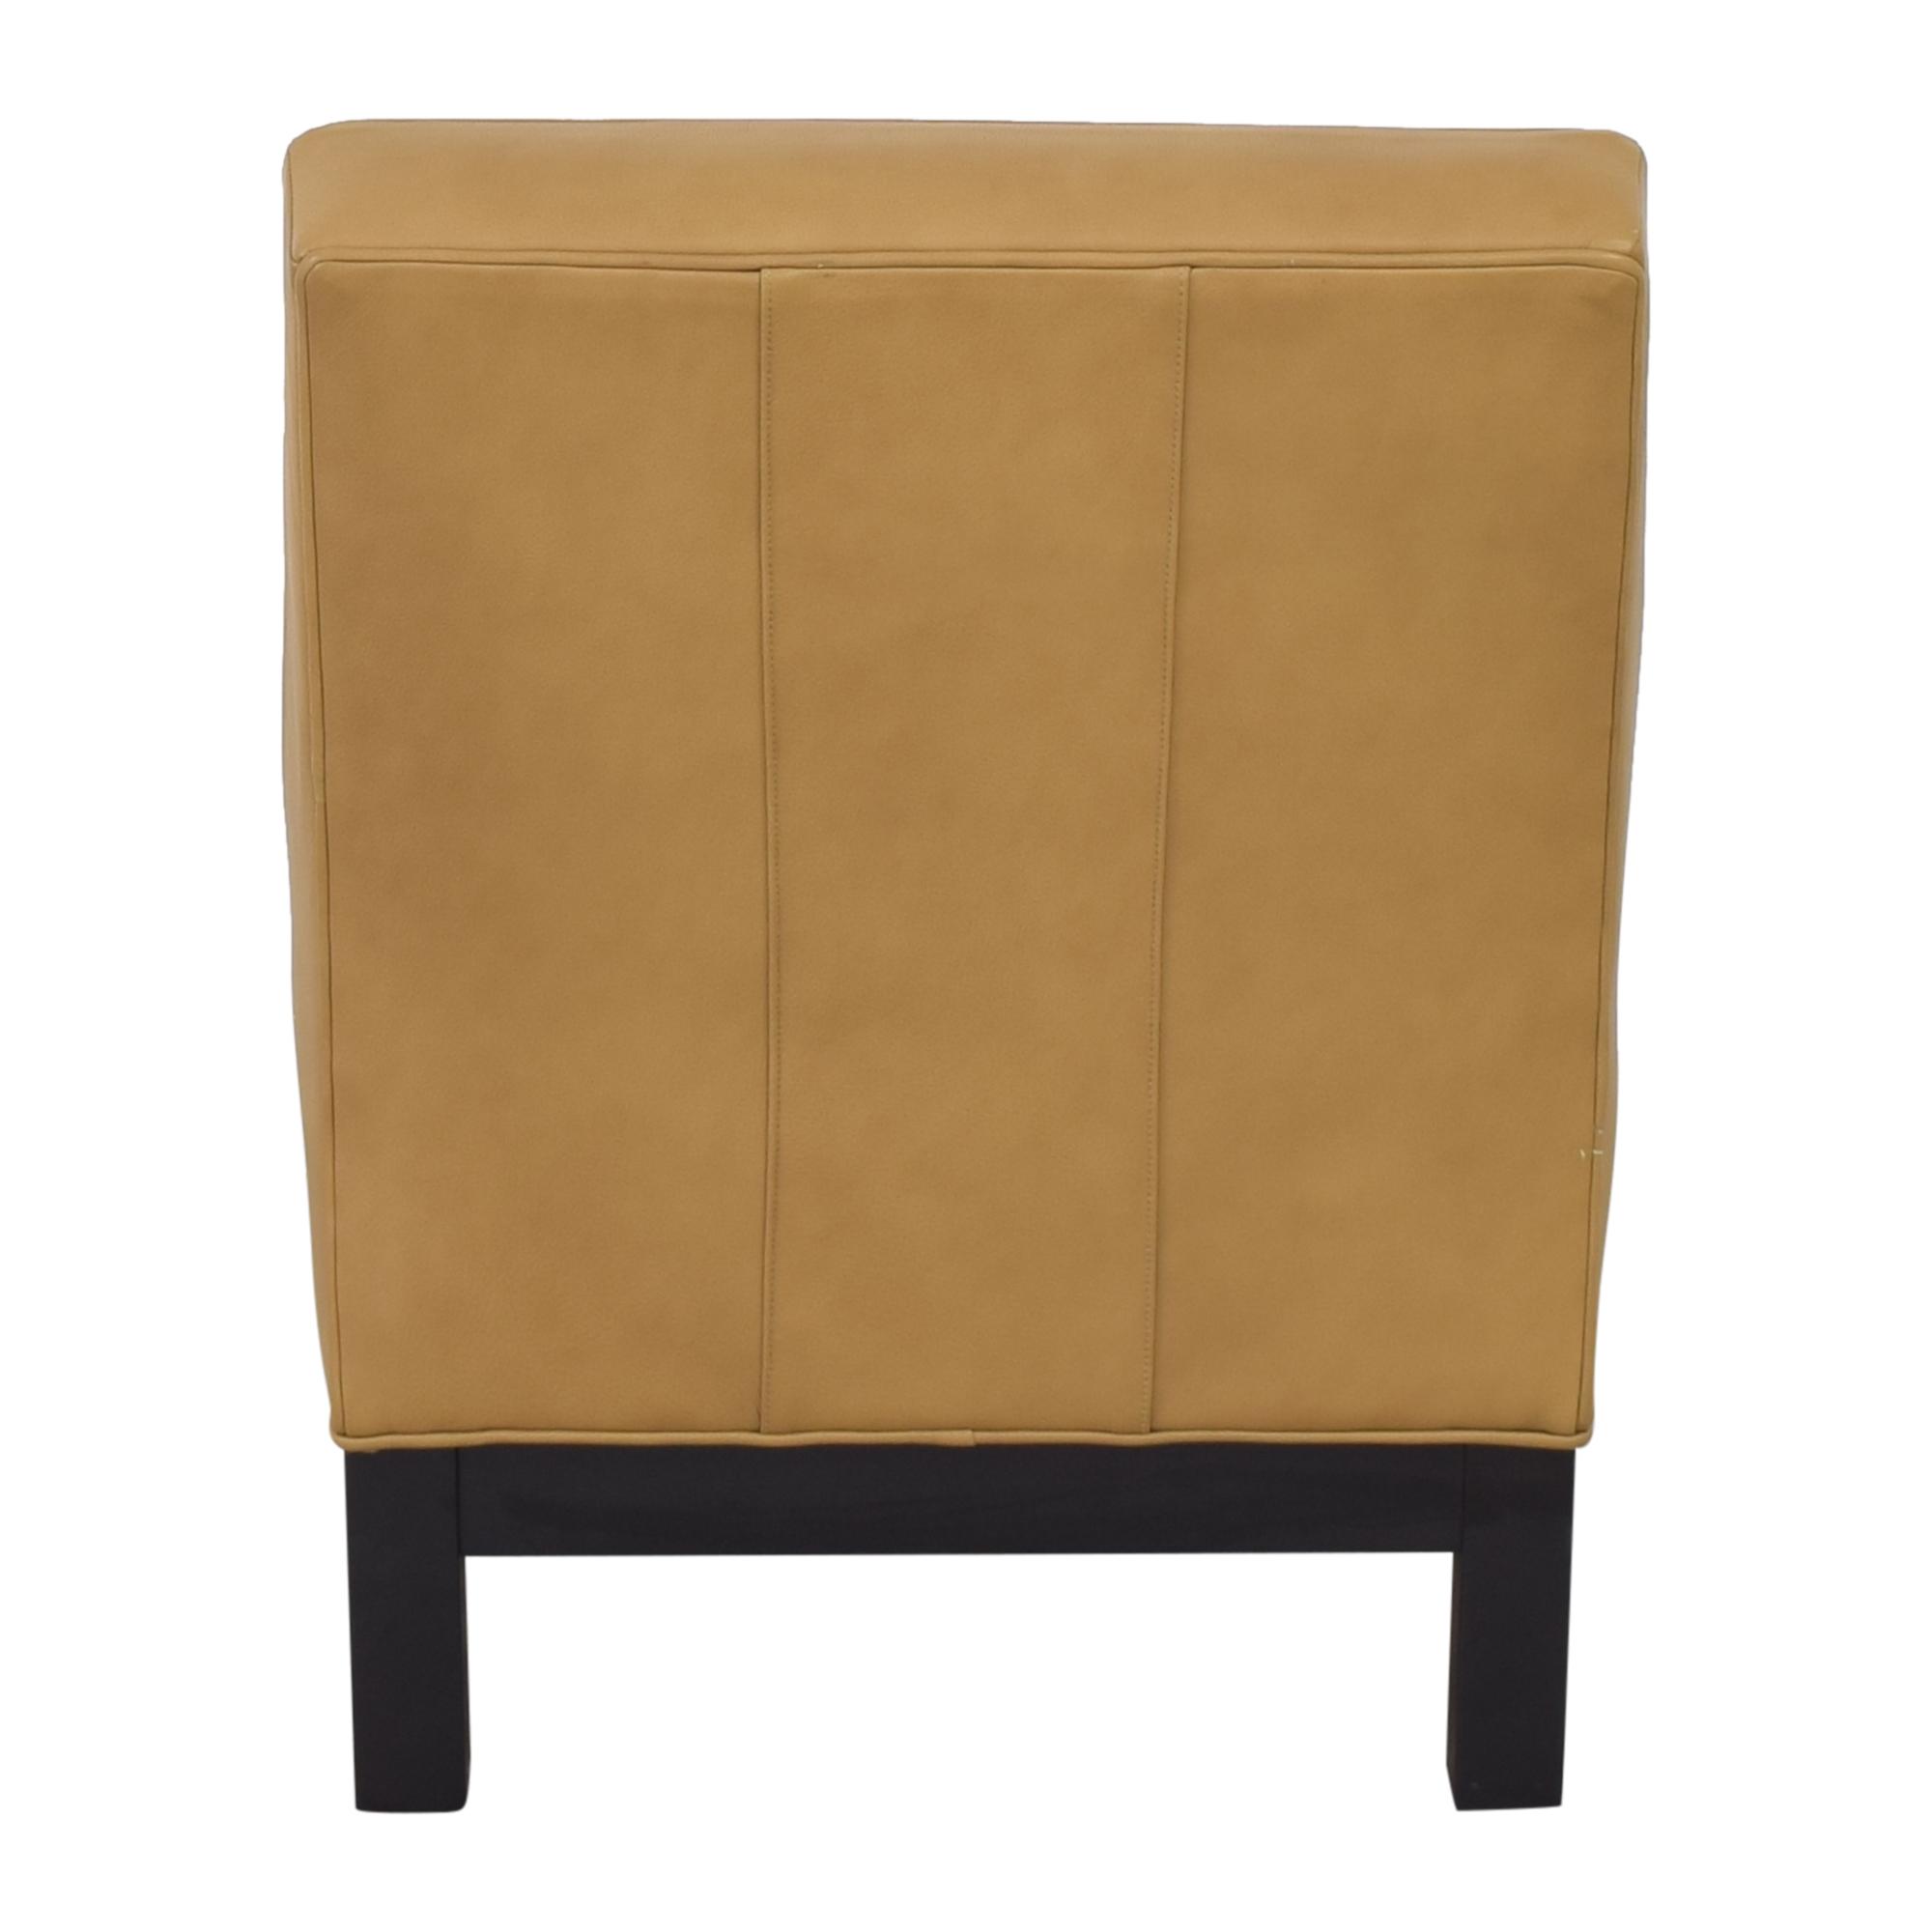 Mitchell Gold + Bob Williams Mitchell Gold + Bob Williams Liana Chair coupon